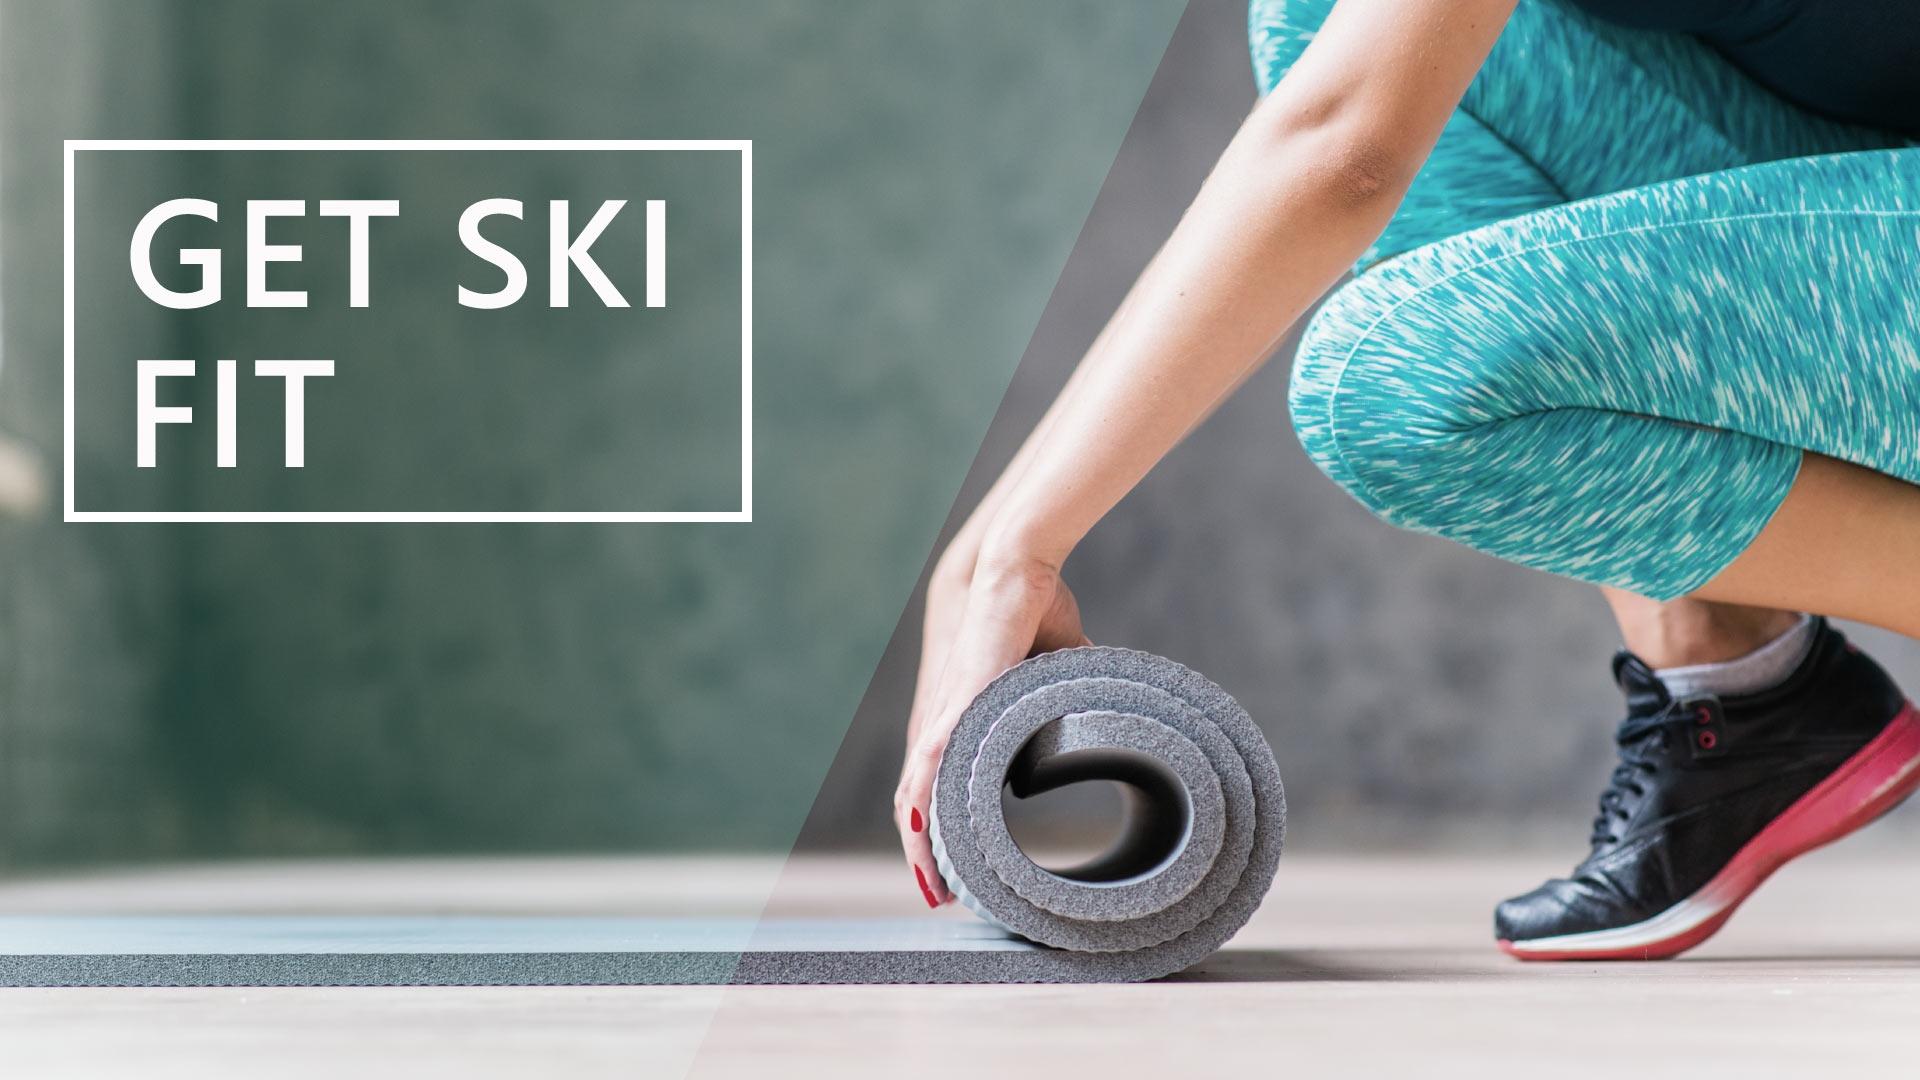 Get Ski Fit!